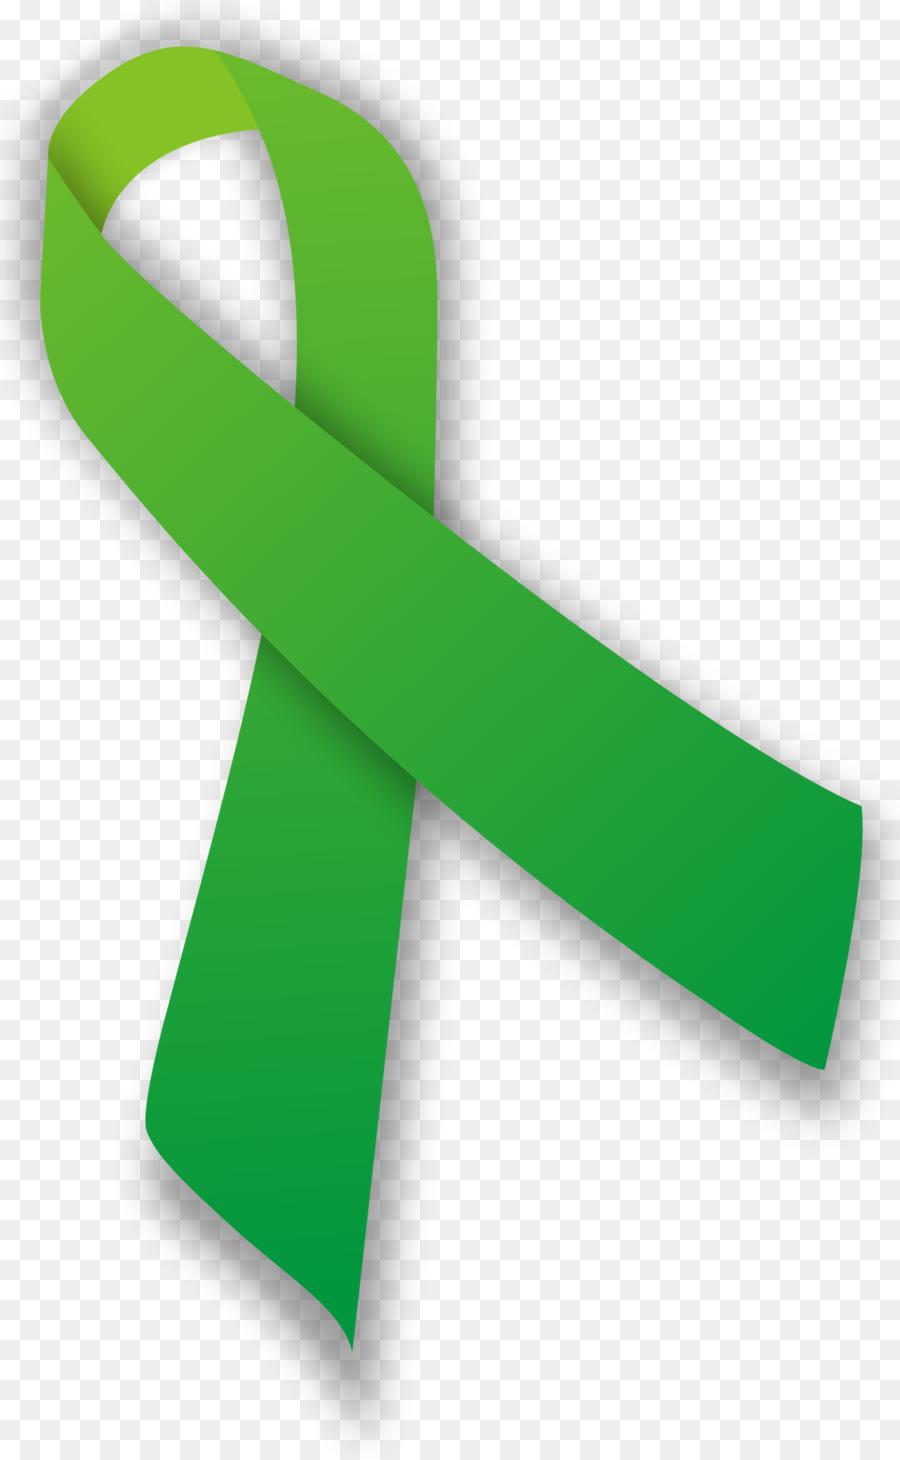 Pita Hijau Png : hijau, Hijau,, Kesadaran,, Gambar